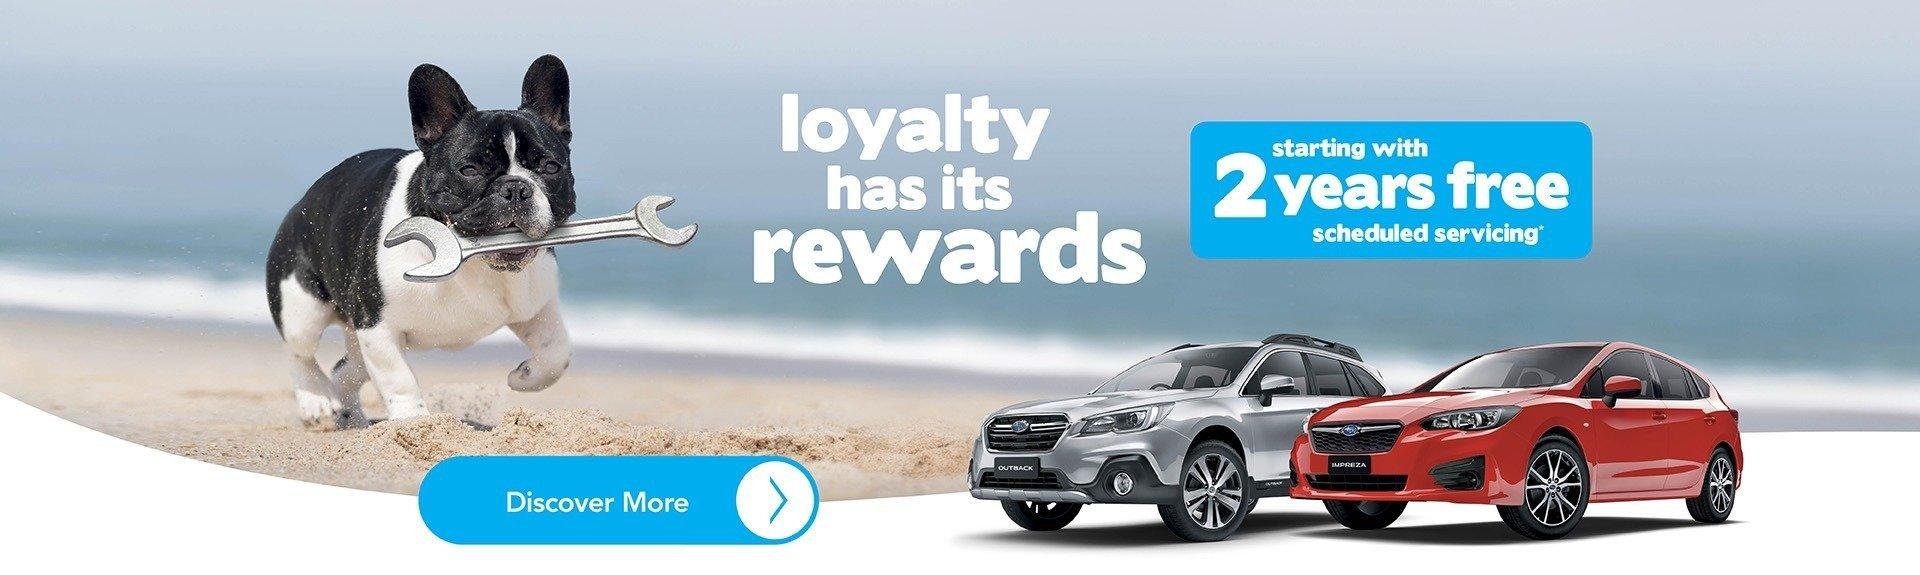 Subaru Free 2 Years Scheduled Servicing